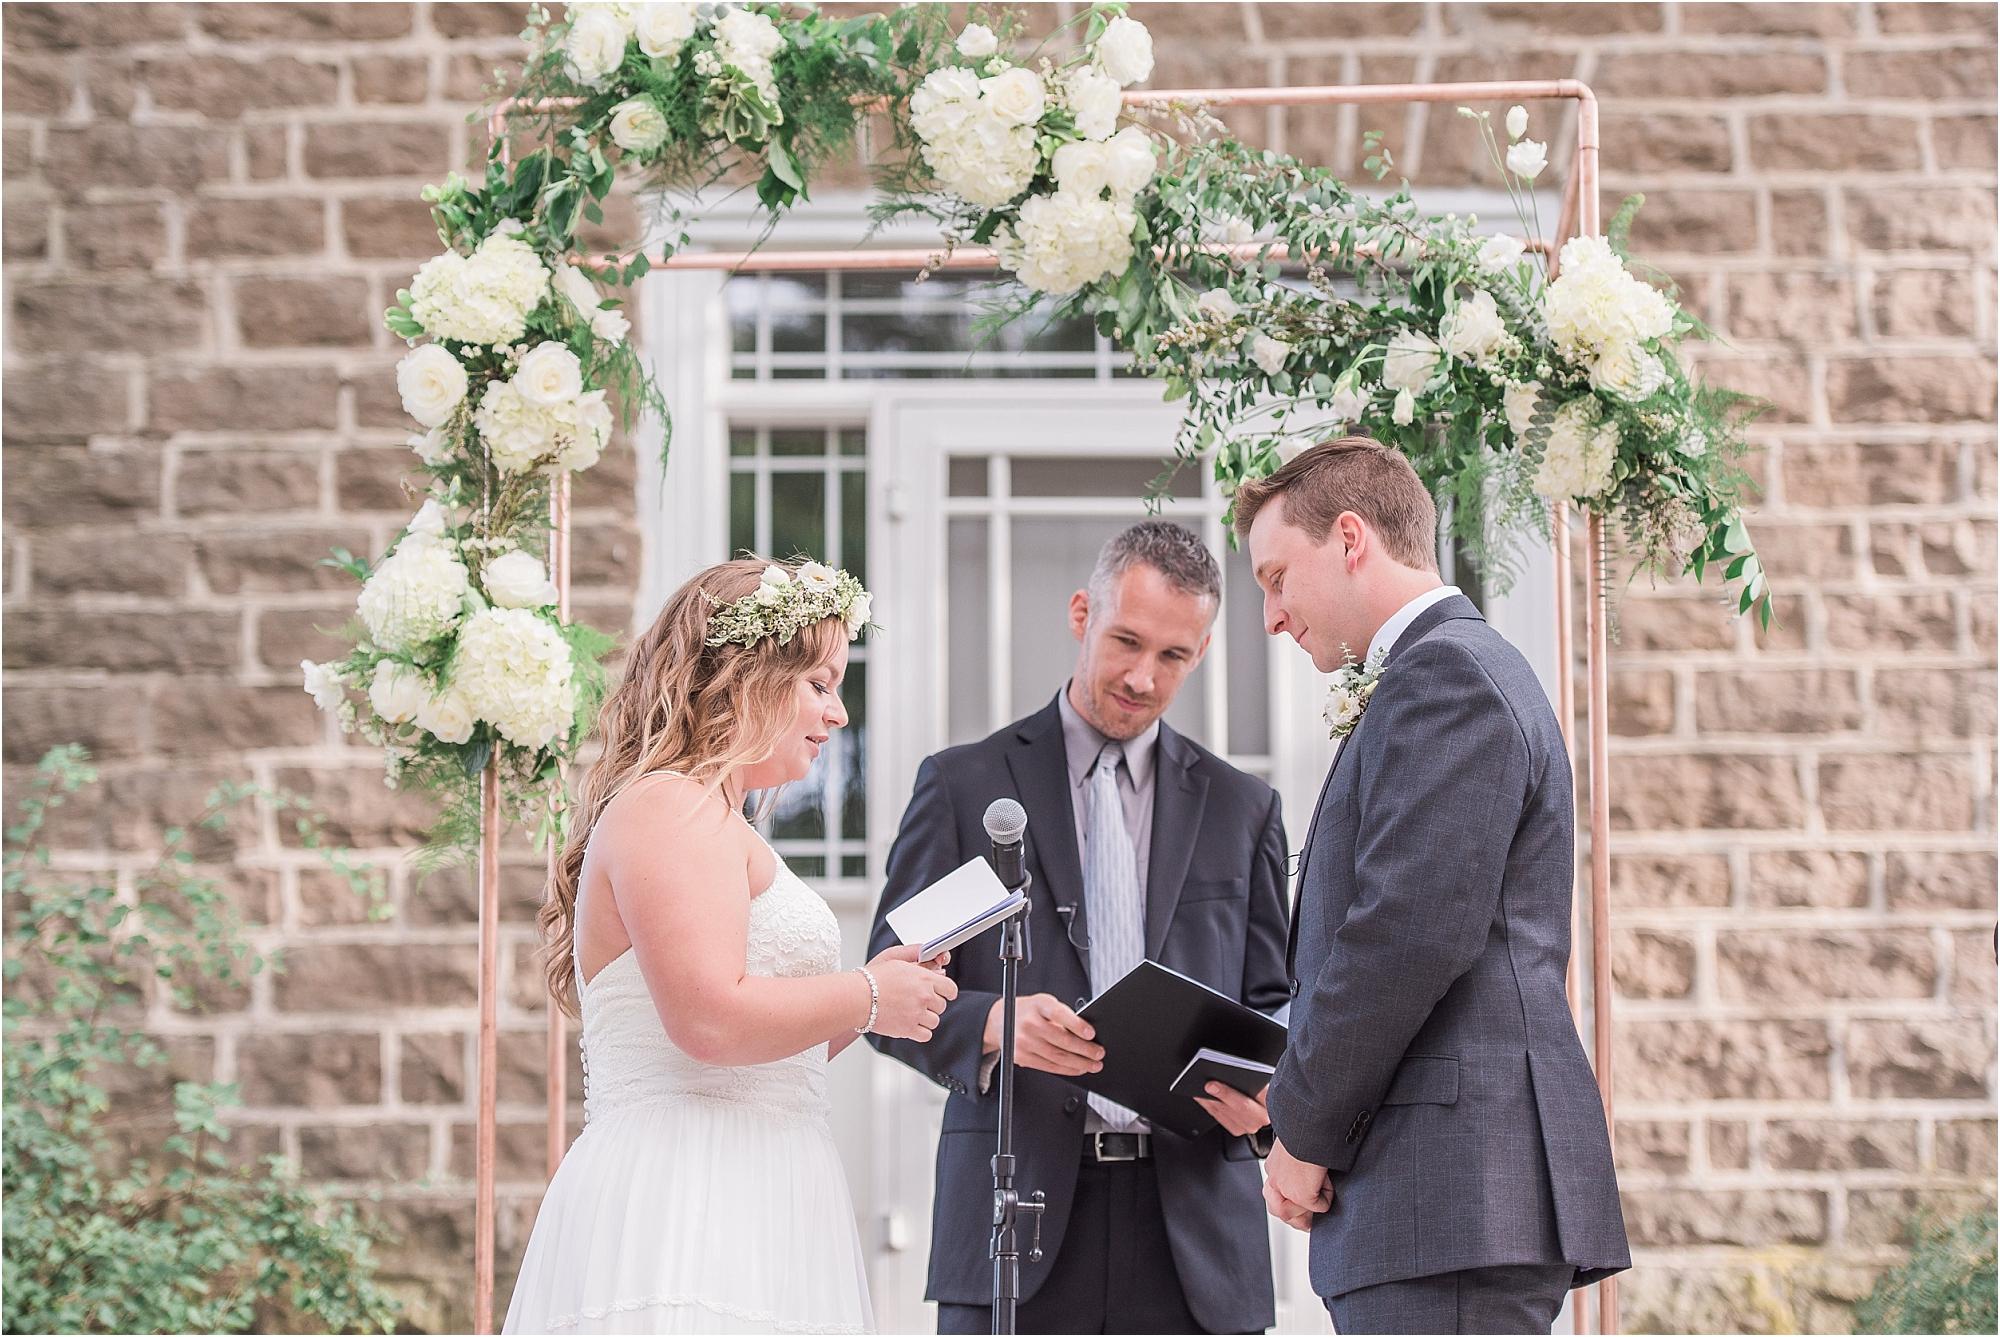 0073 Summer Stonefields Wedding Carleton Place - Ottawa Wedding - Photography by Emma_WEB.jpg